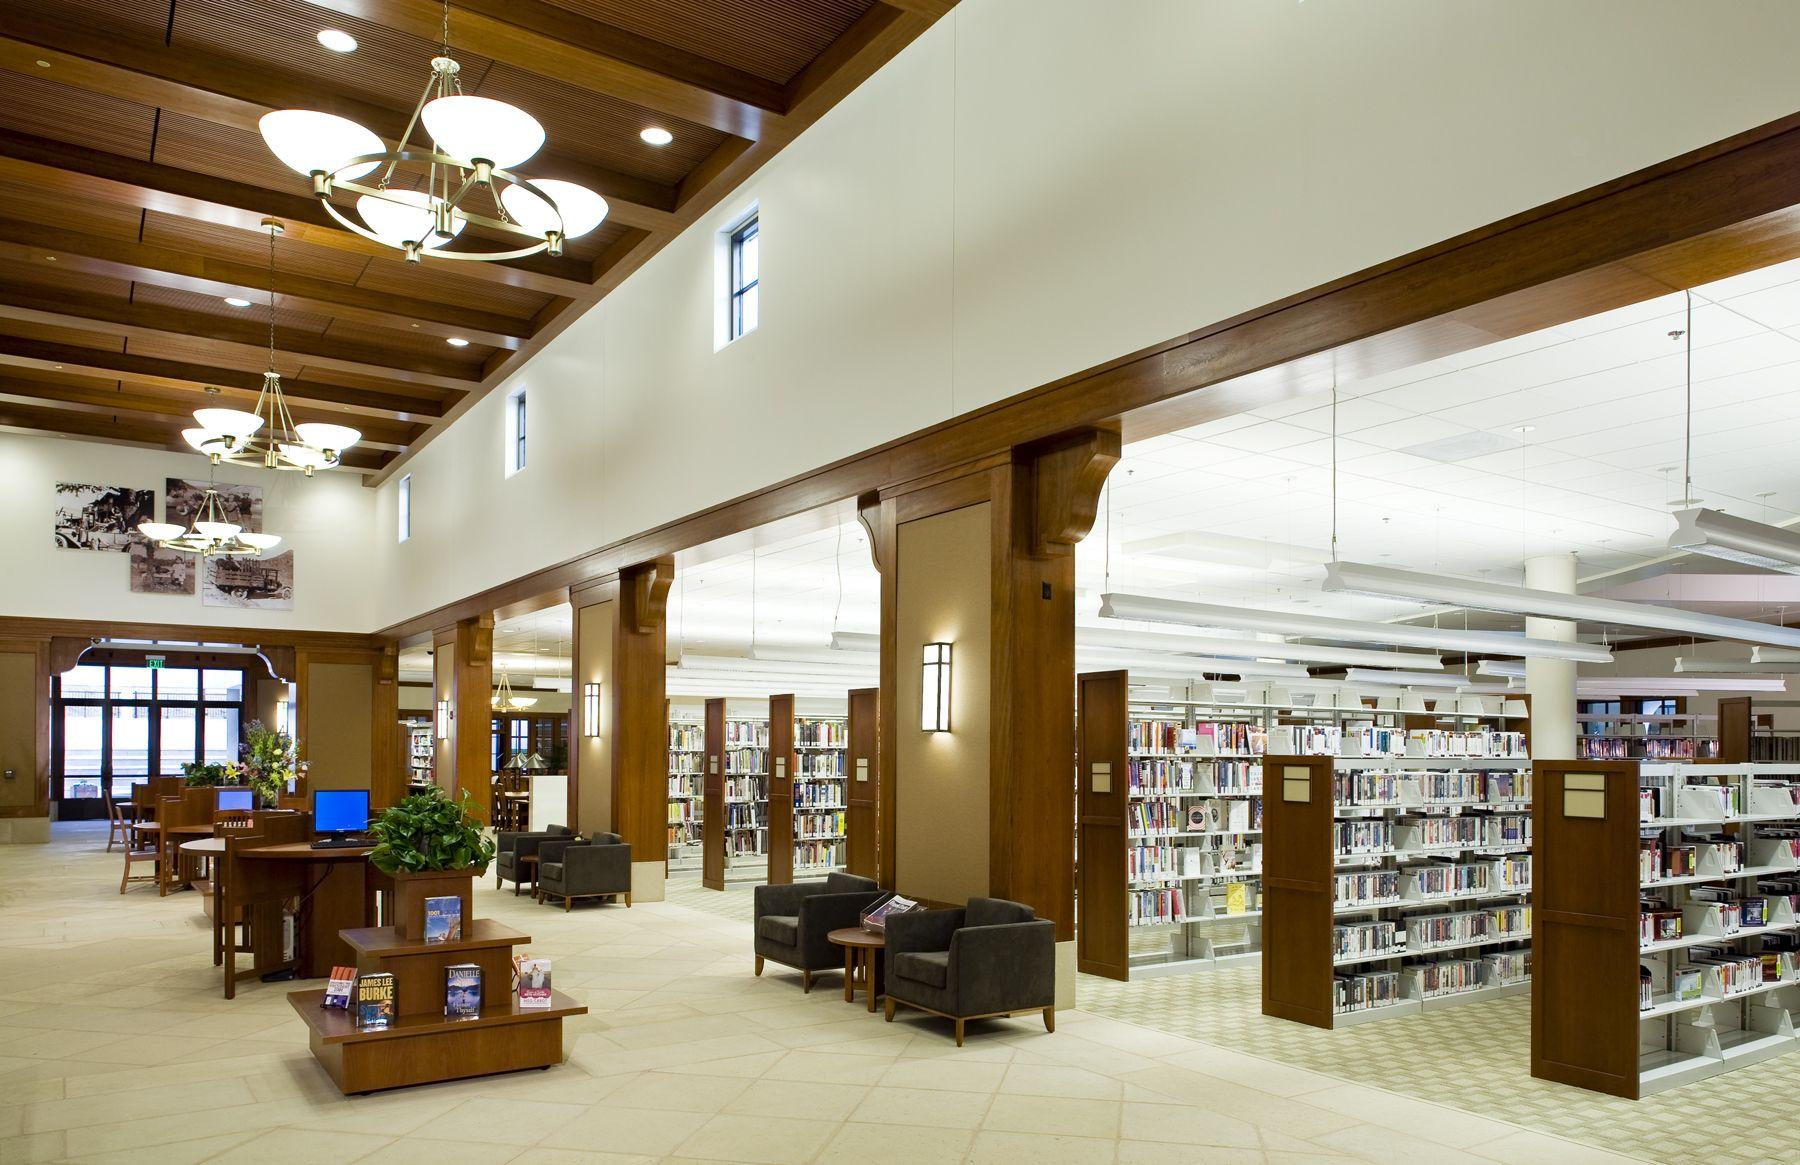 Inside the Calabasas Civic Center & Library Calabasas